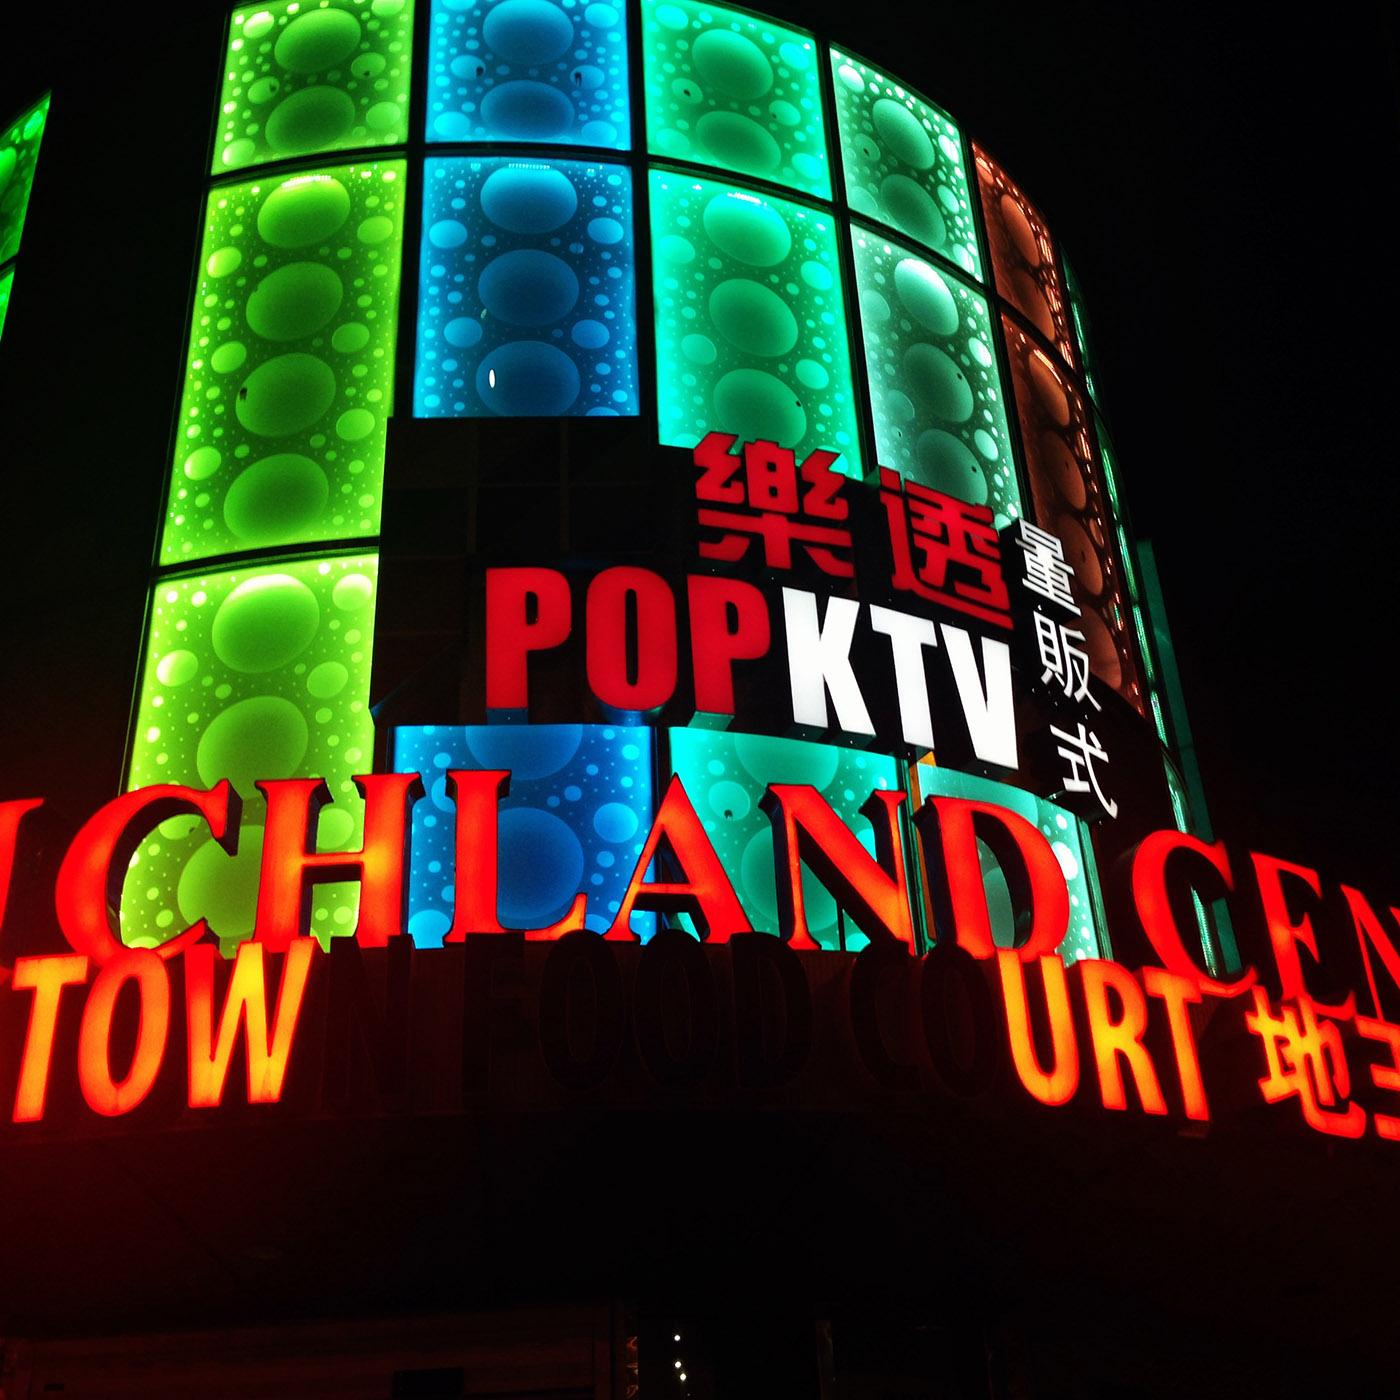 POPKTV: late night karaoke in Chinatown.